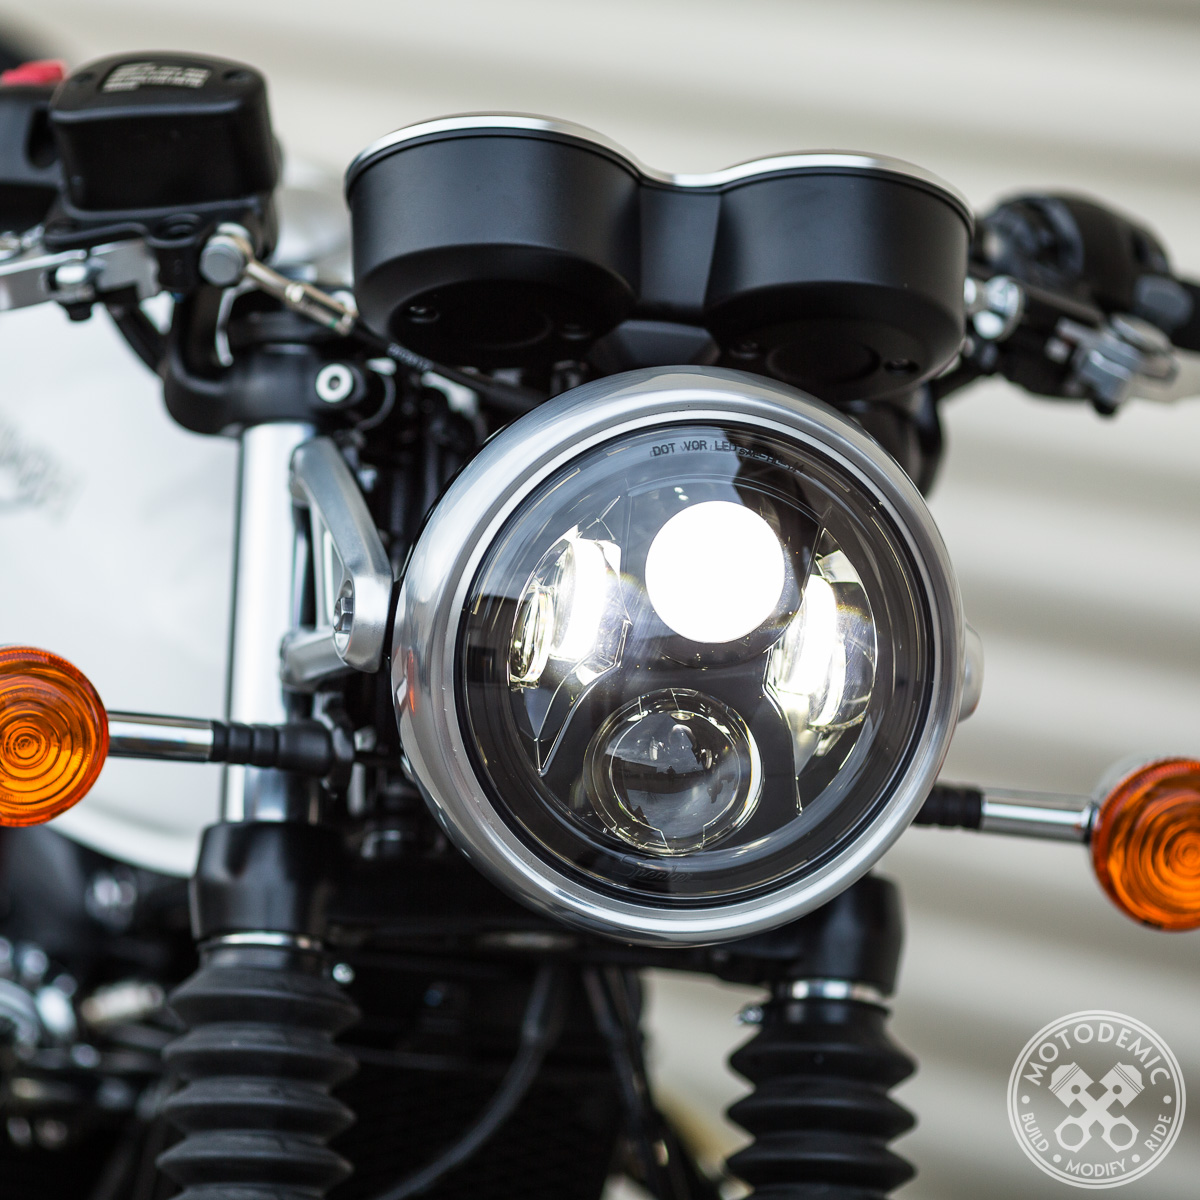 Single 7 Inch Standard LED Headlight Conversion Kit by Motodemic